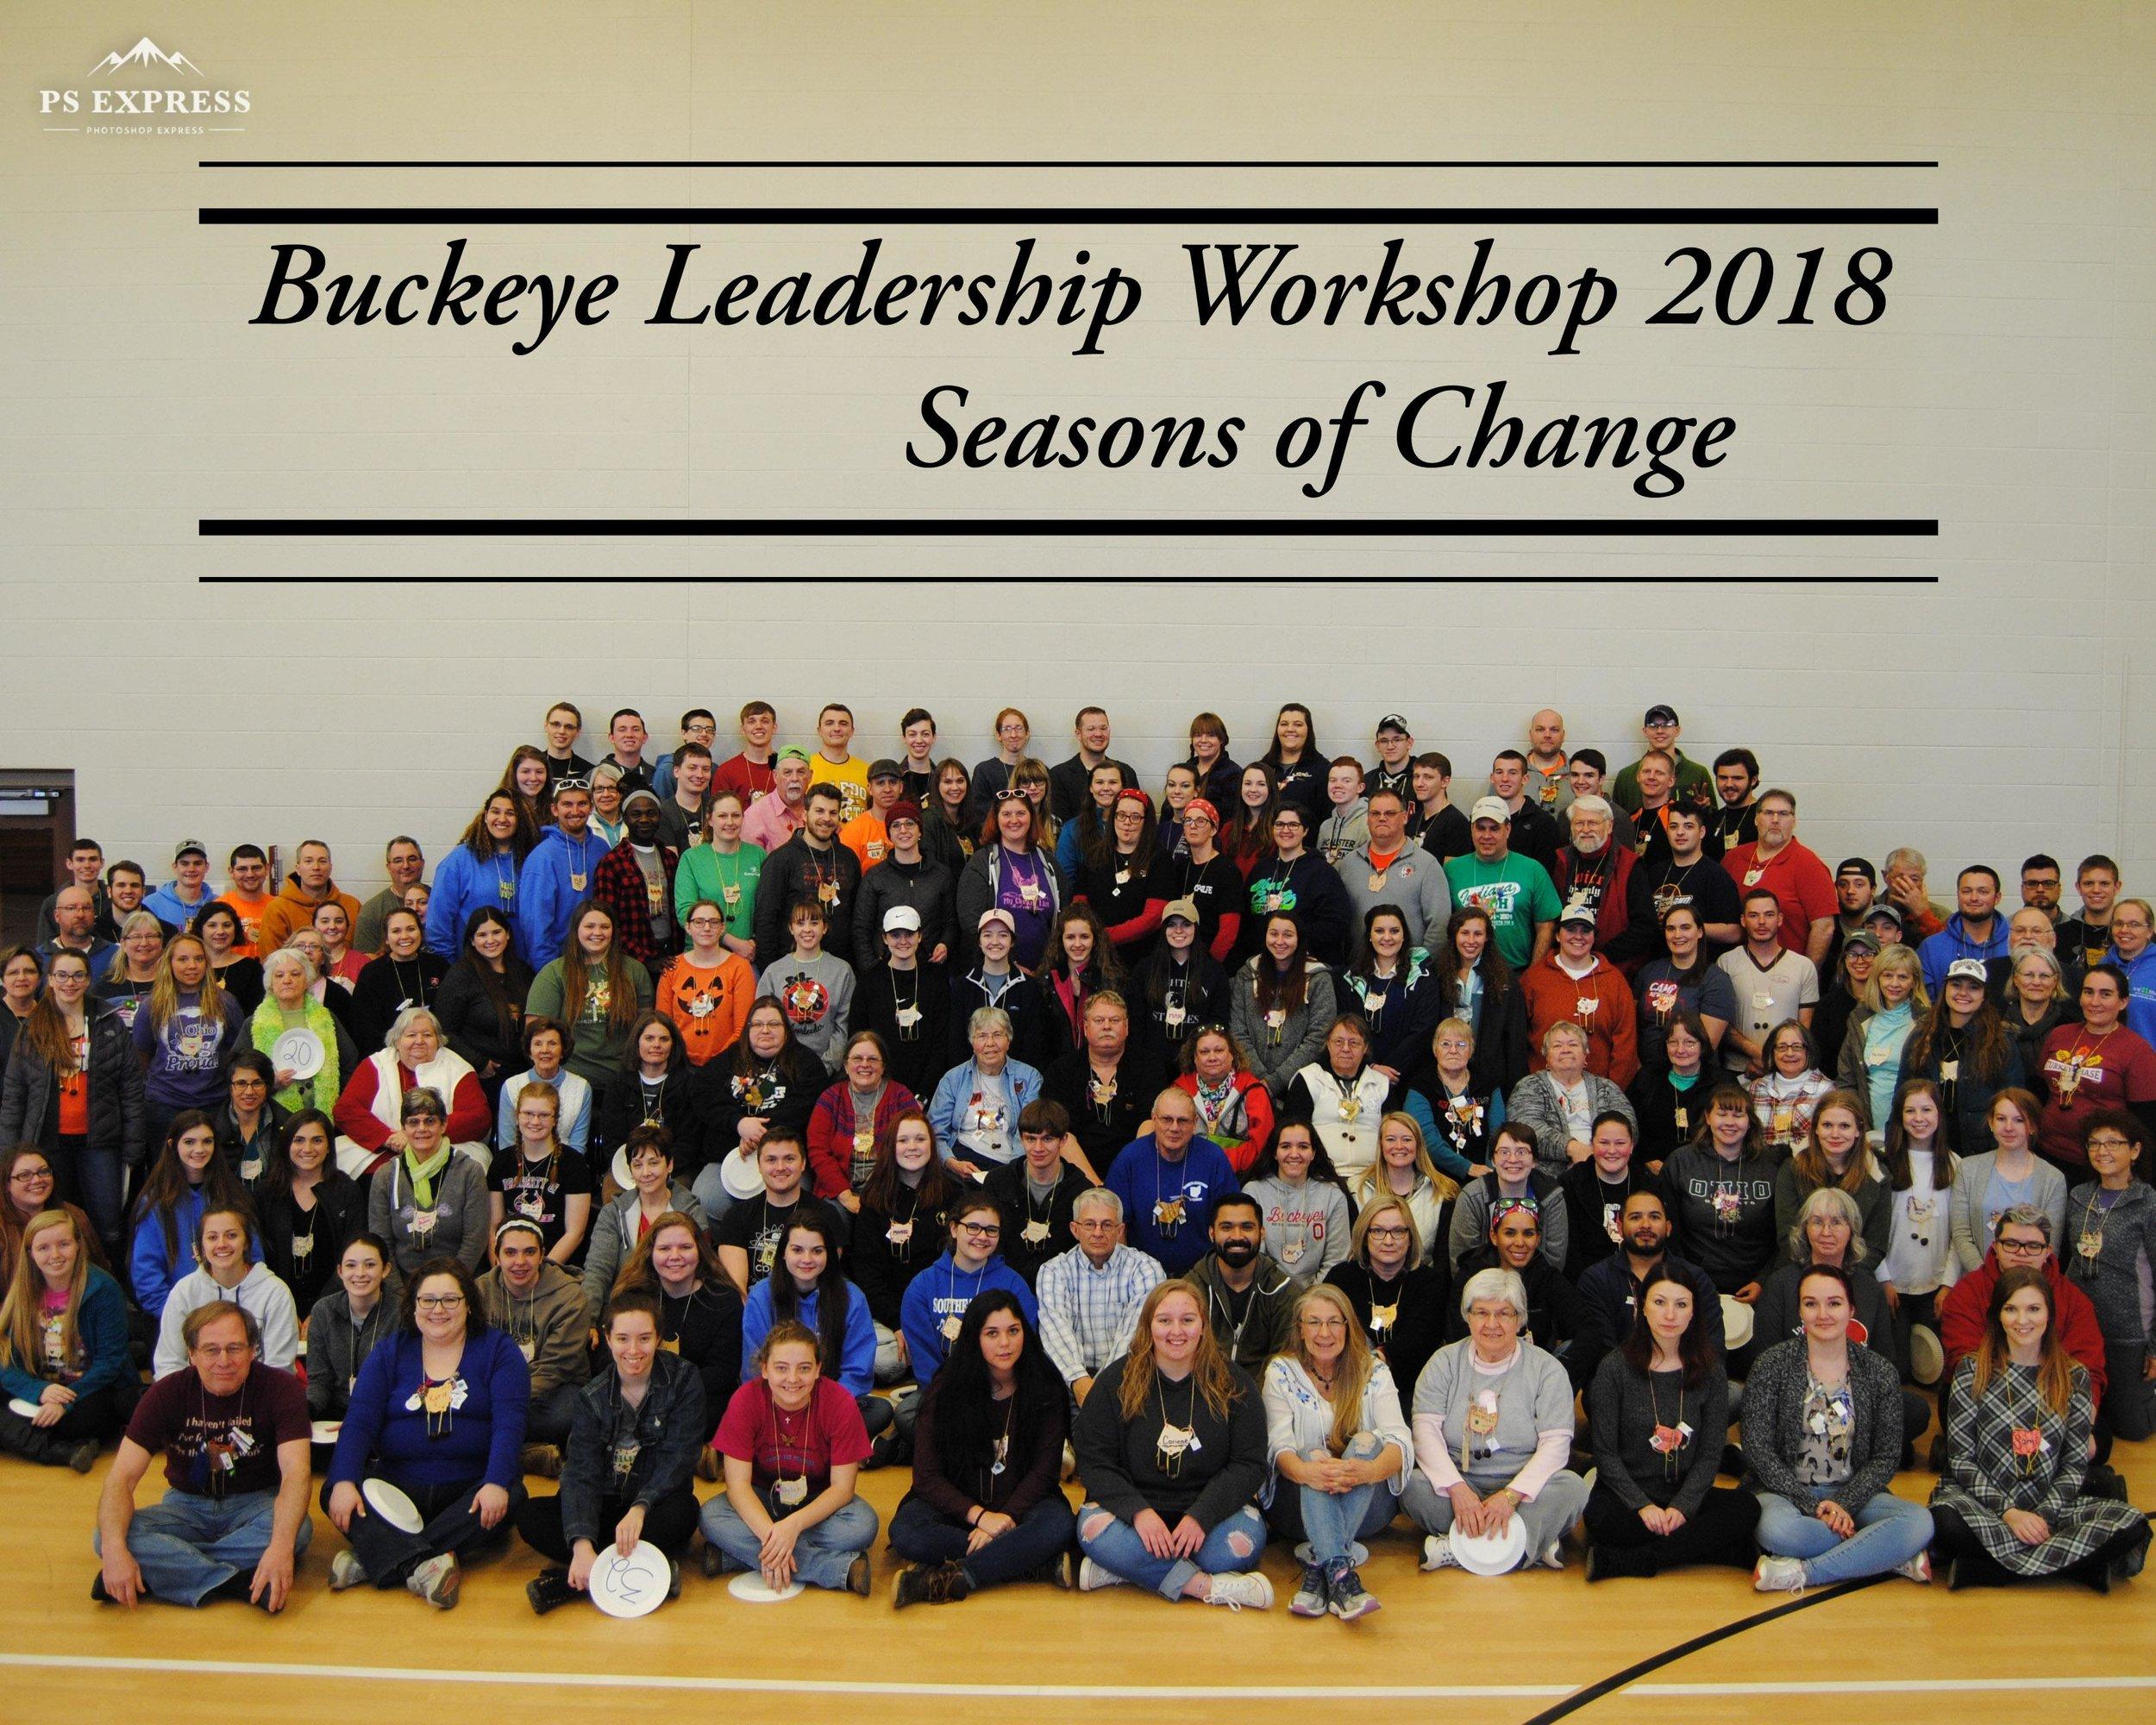 BLW 2018 Group Photo.jpg